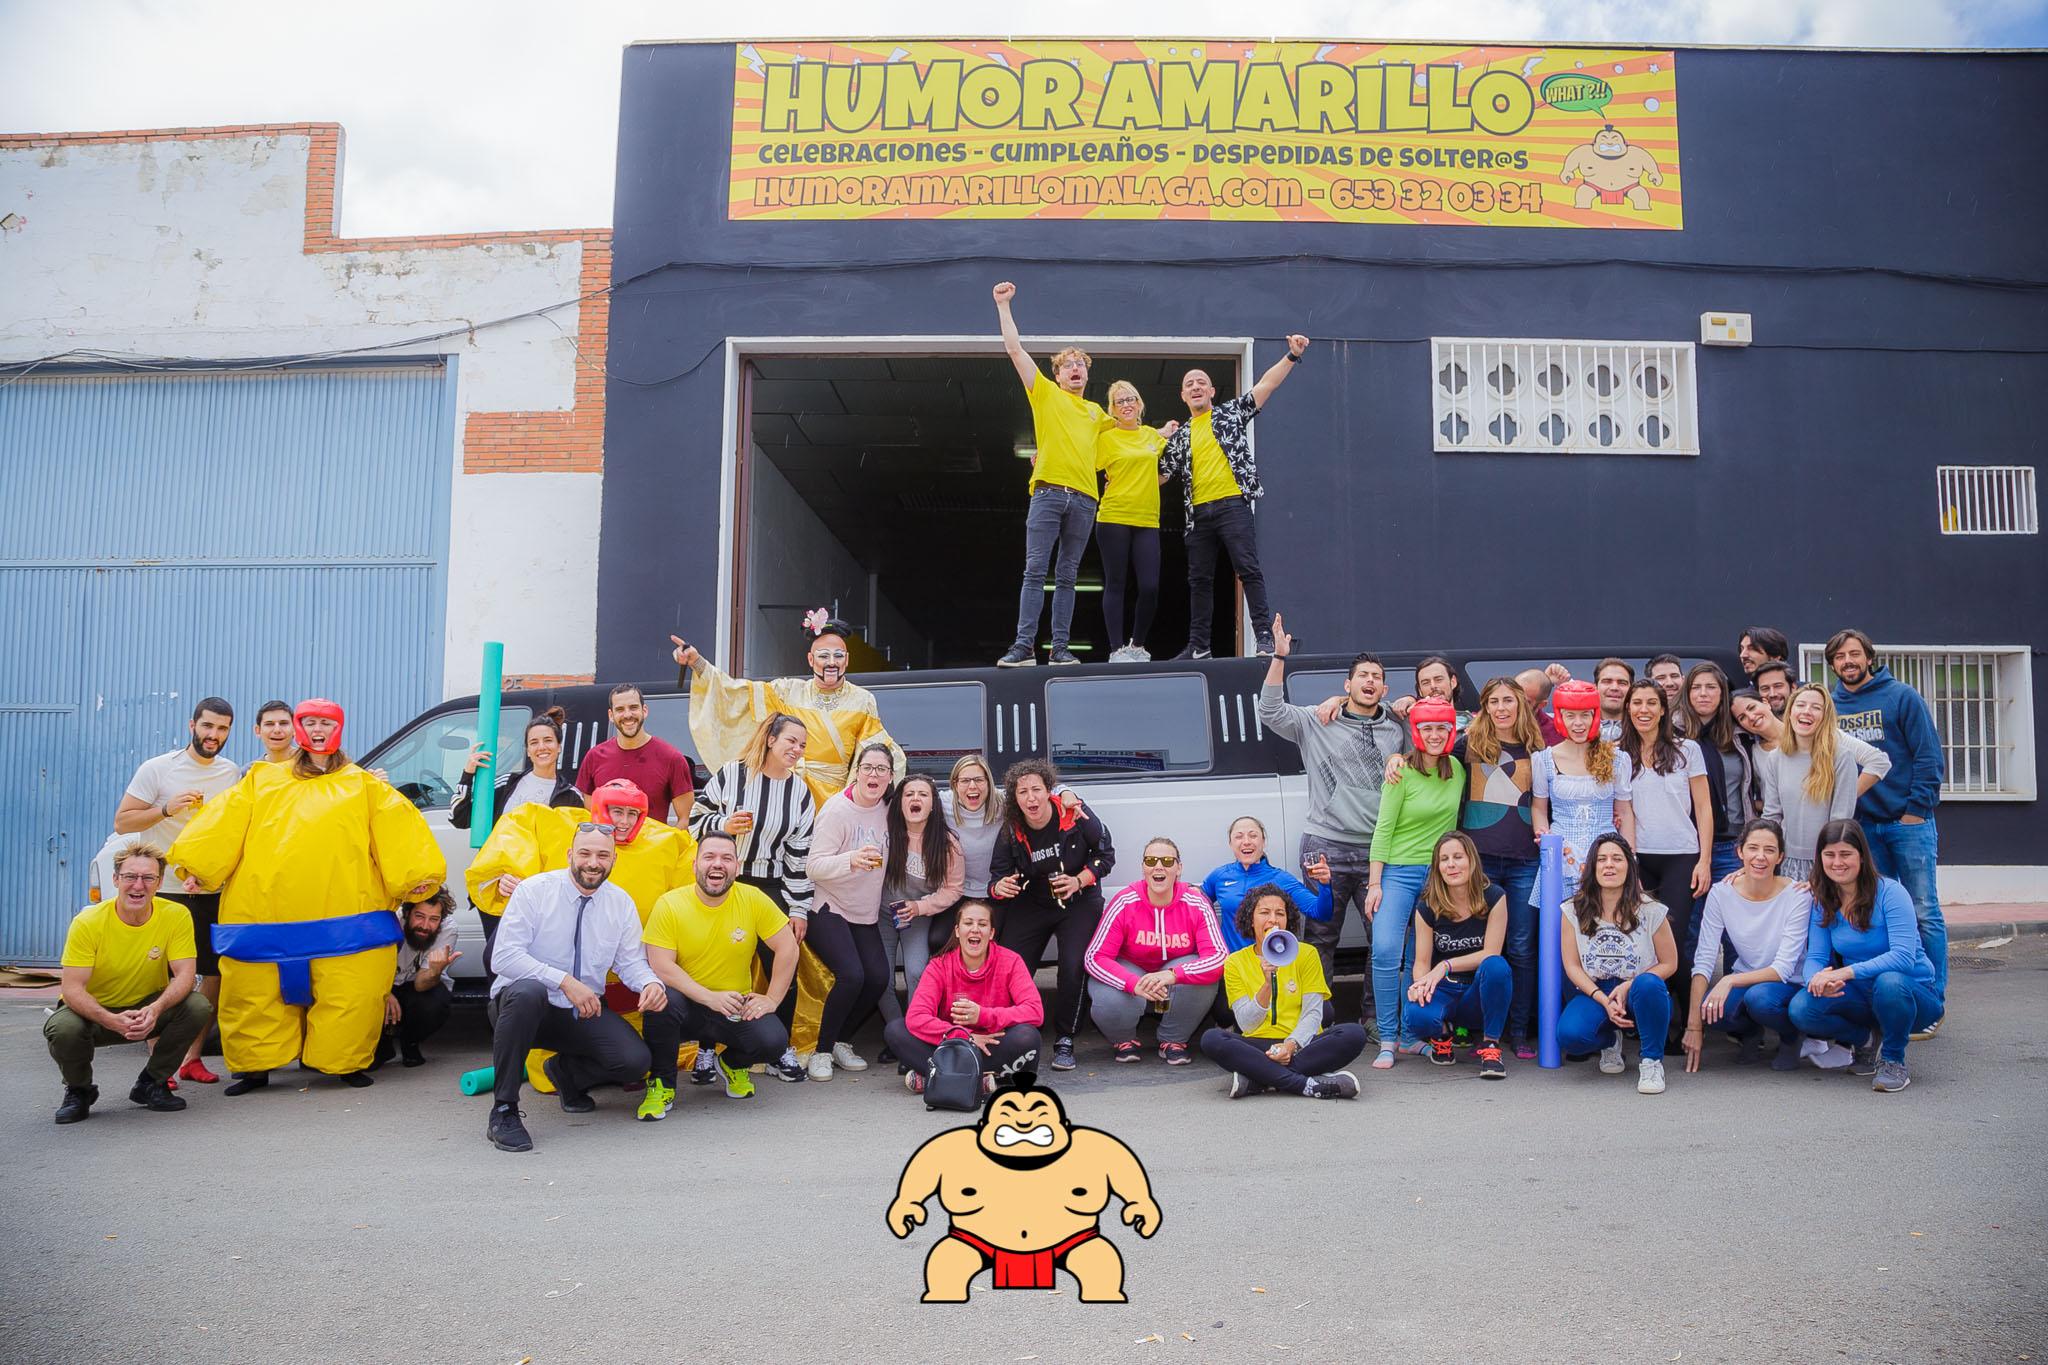 Humor amarillo Malaga